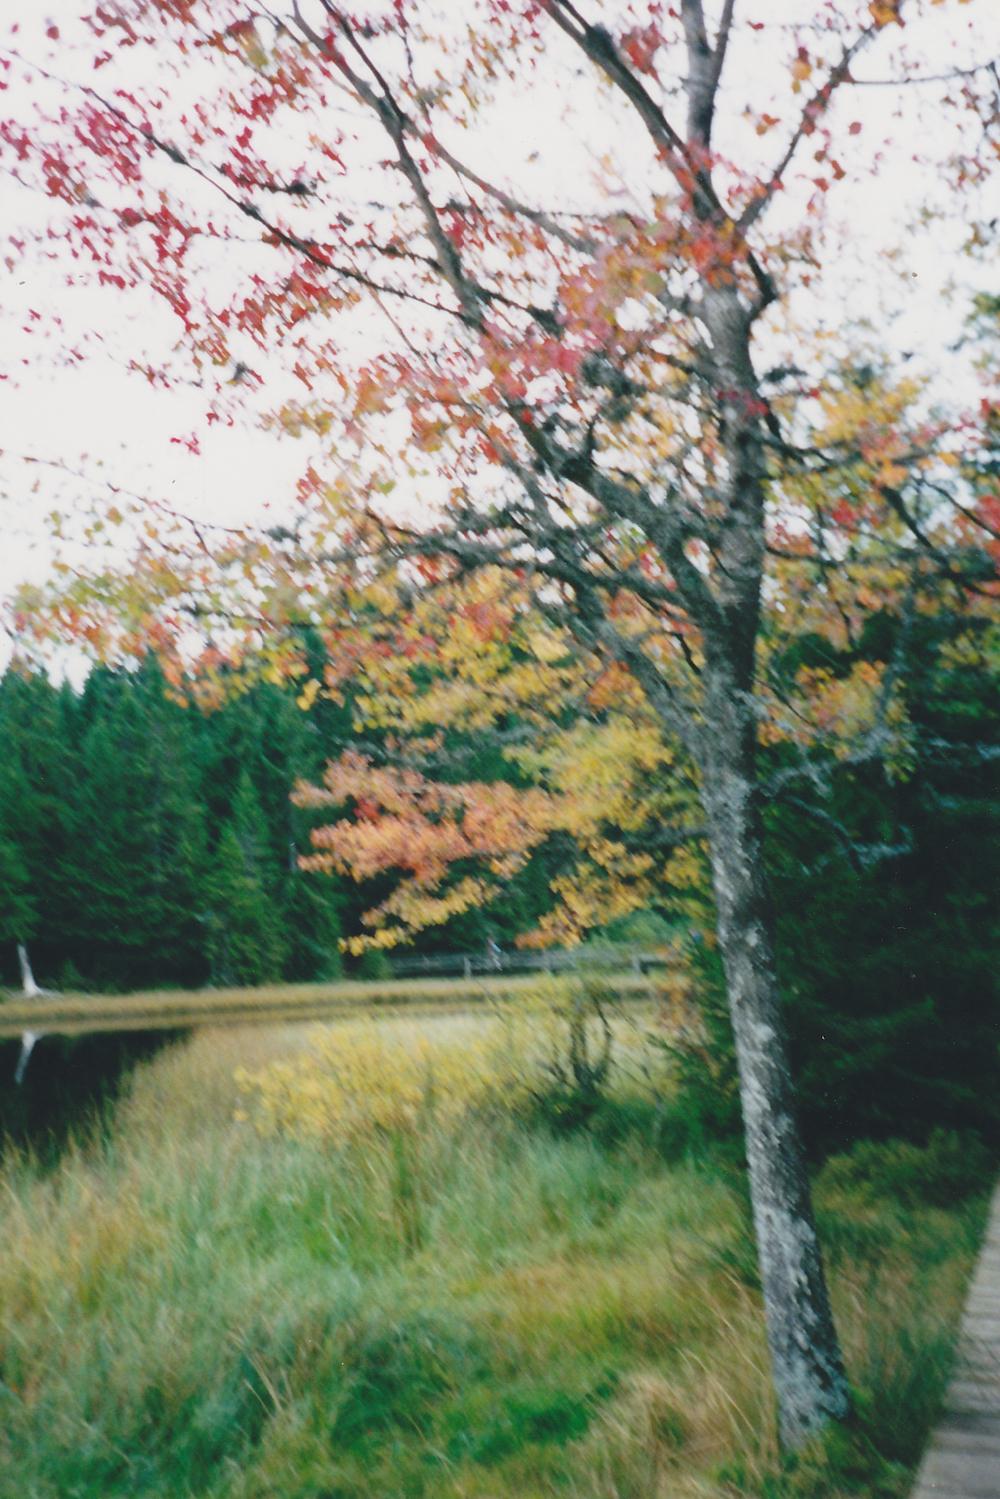 Autumn, Switzerland, 2001.